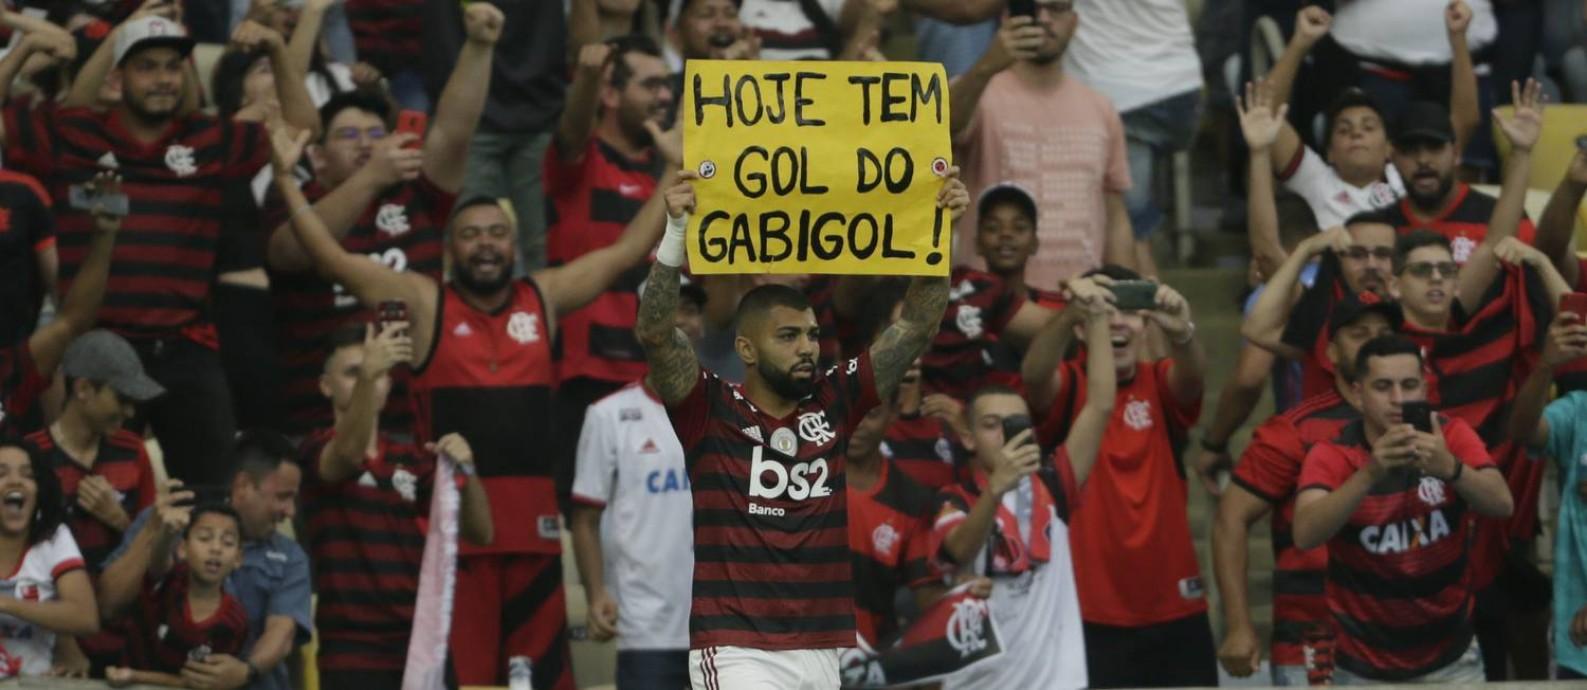 RI Rio de Janeiro (RJ) 01/09/2019 Flamengo x palmeiras brasileirao gabigol comemora seu gol Foto: Antonio Scorza / Agencia O Globo Foto: Antonio Scorza / Agência O Globo